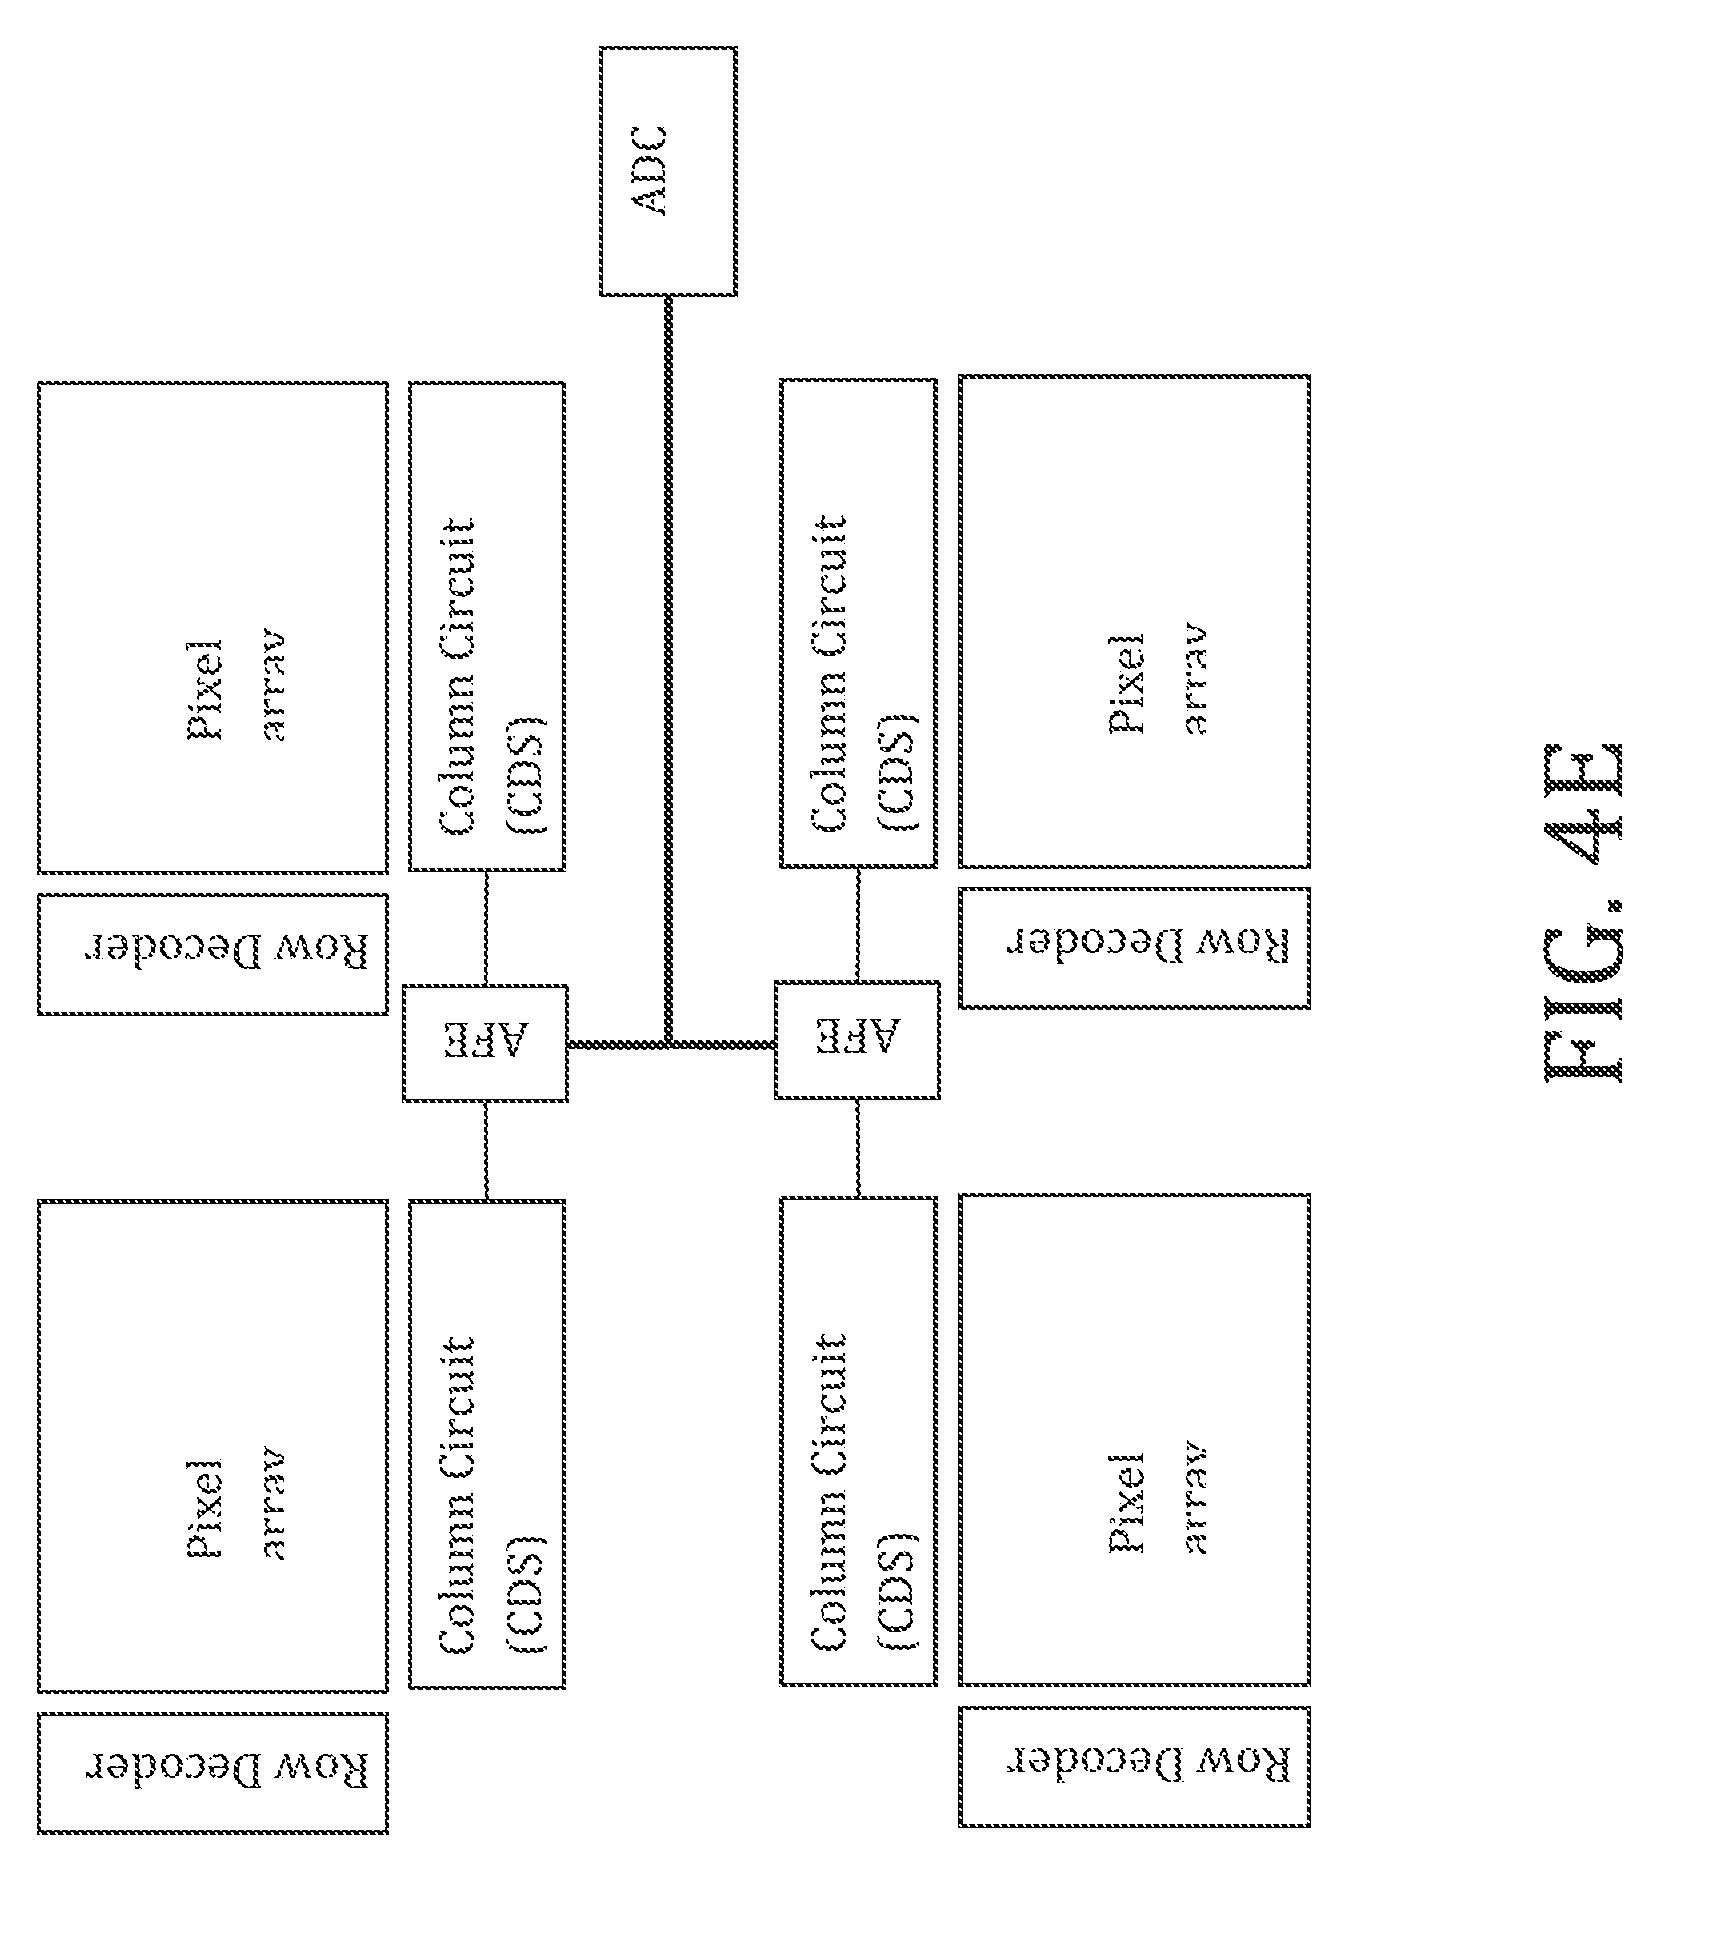 Patent US 8,928,793 B2 on